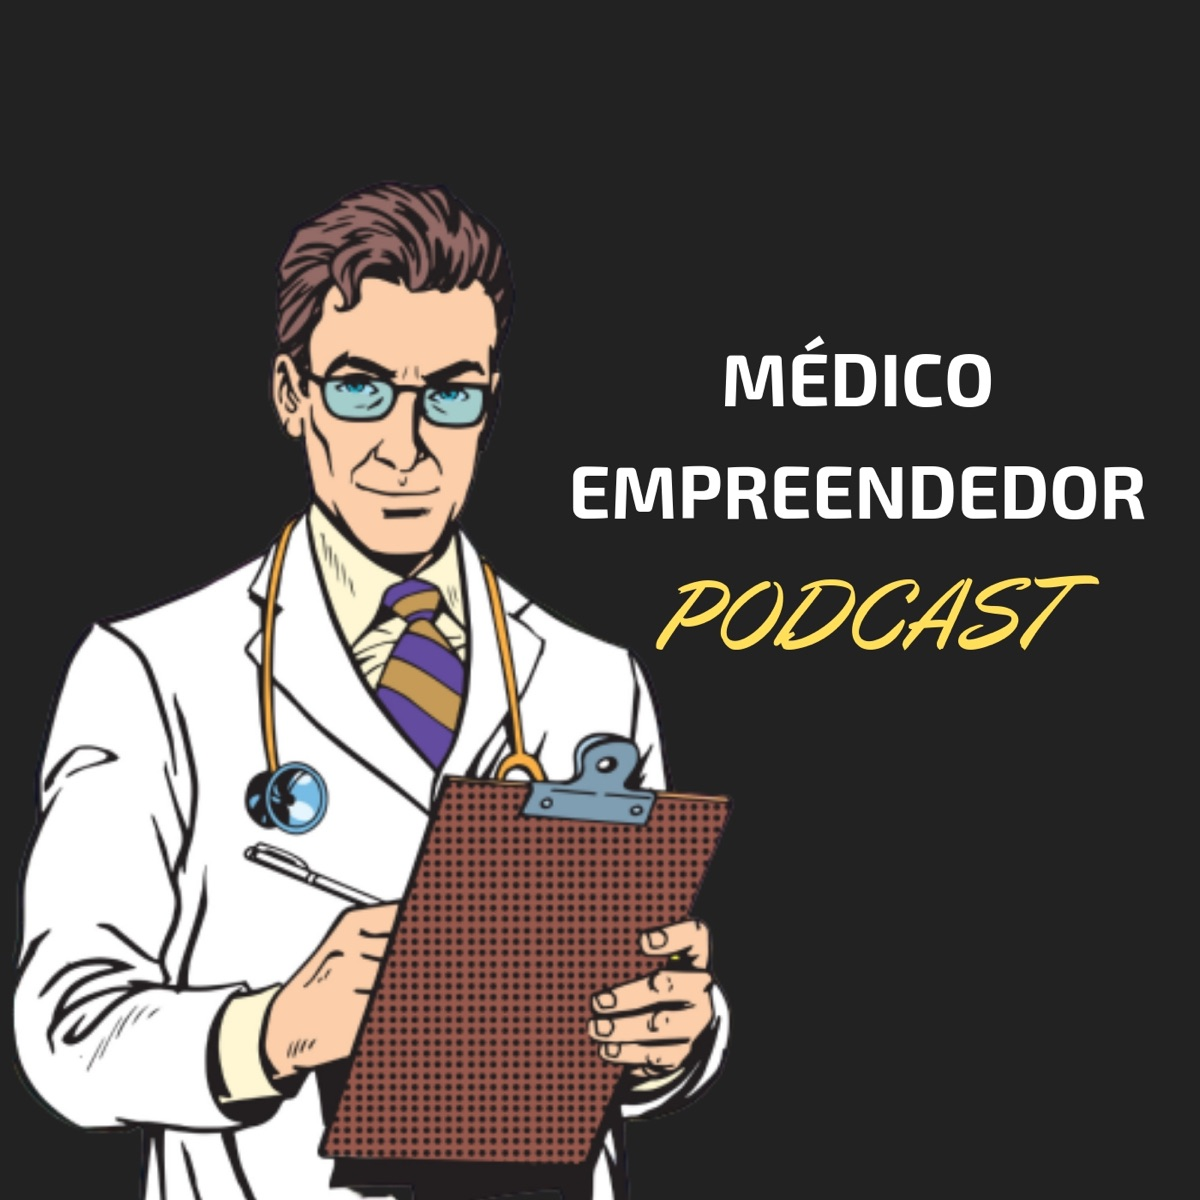 Médico Empreendedor